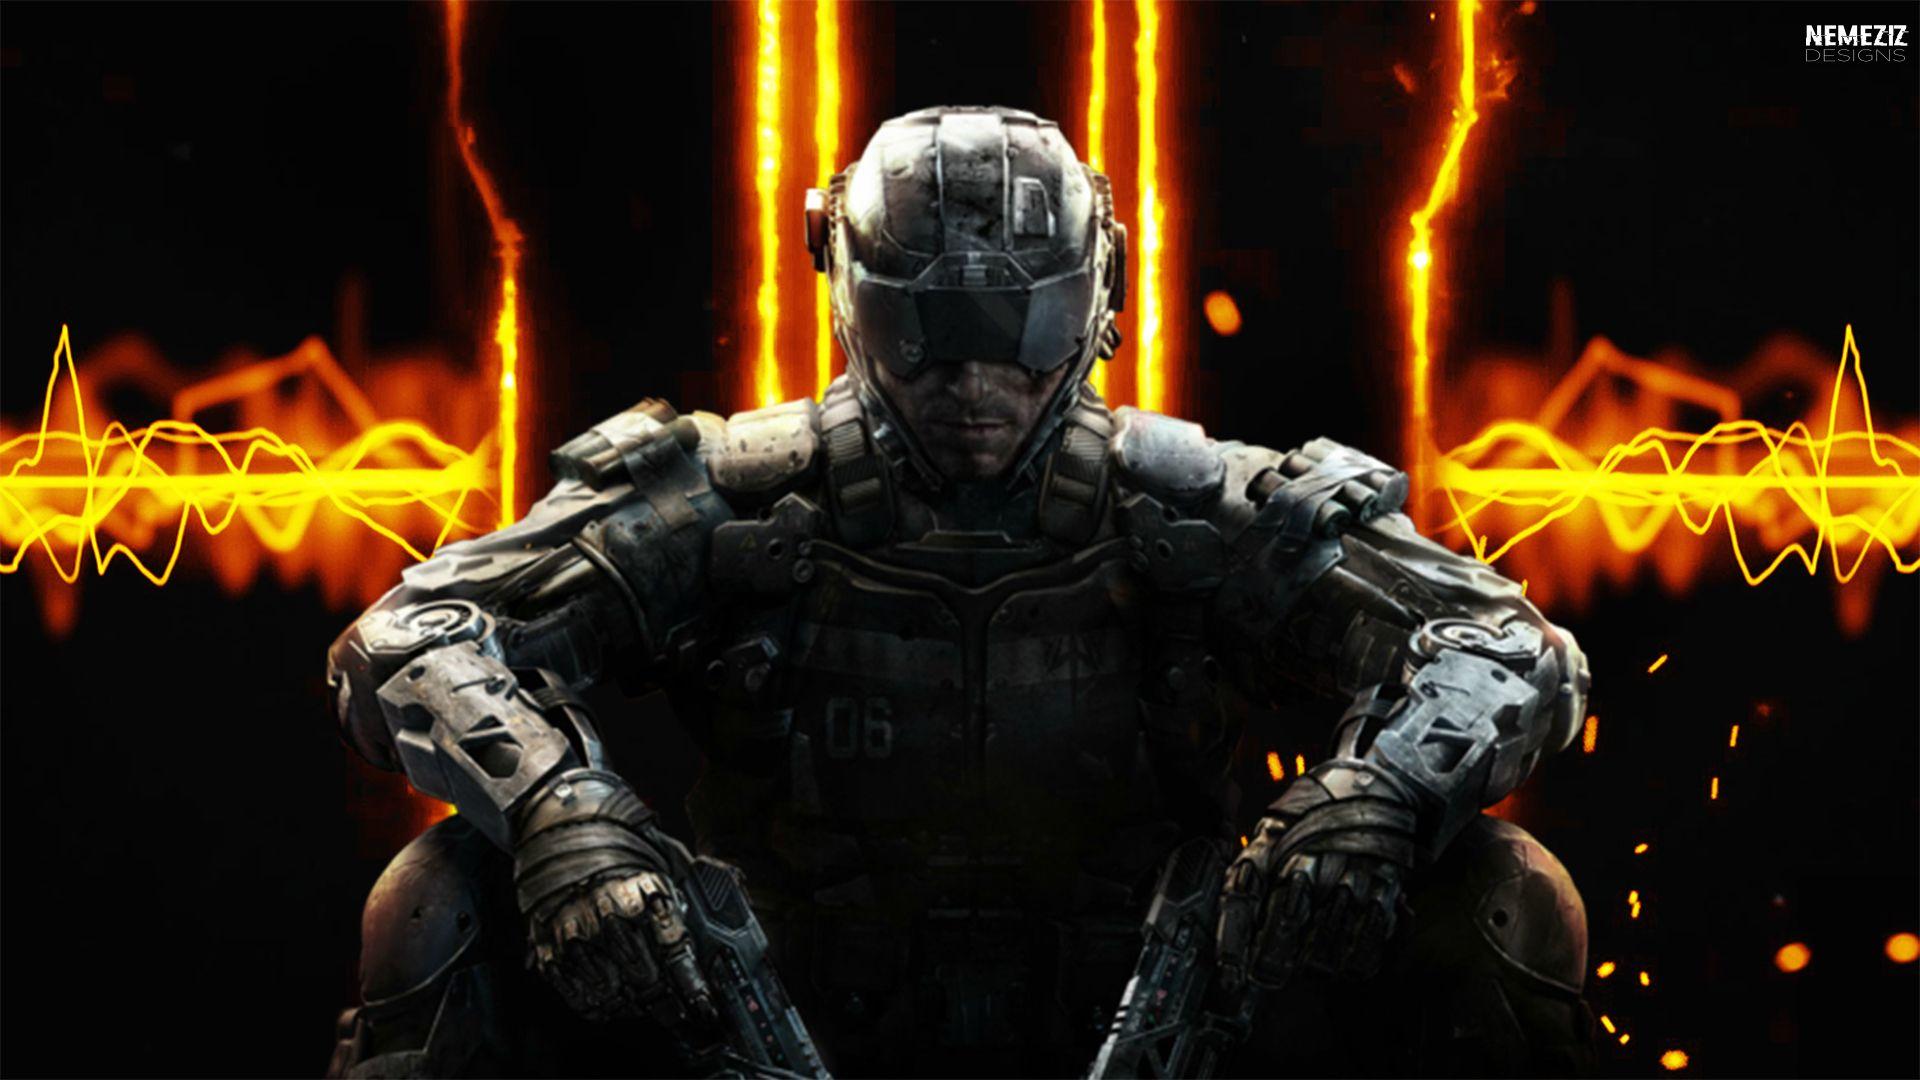 Black Ops 3 Hd Wallpapers 48 Desktop Images Of Black Ops 3 Hd Call Of Duty Black Ops 3 Call Of Duty Black Ops Iii Call Of Duty Black